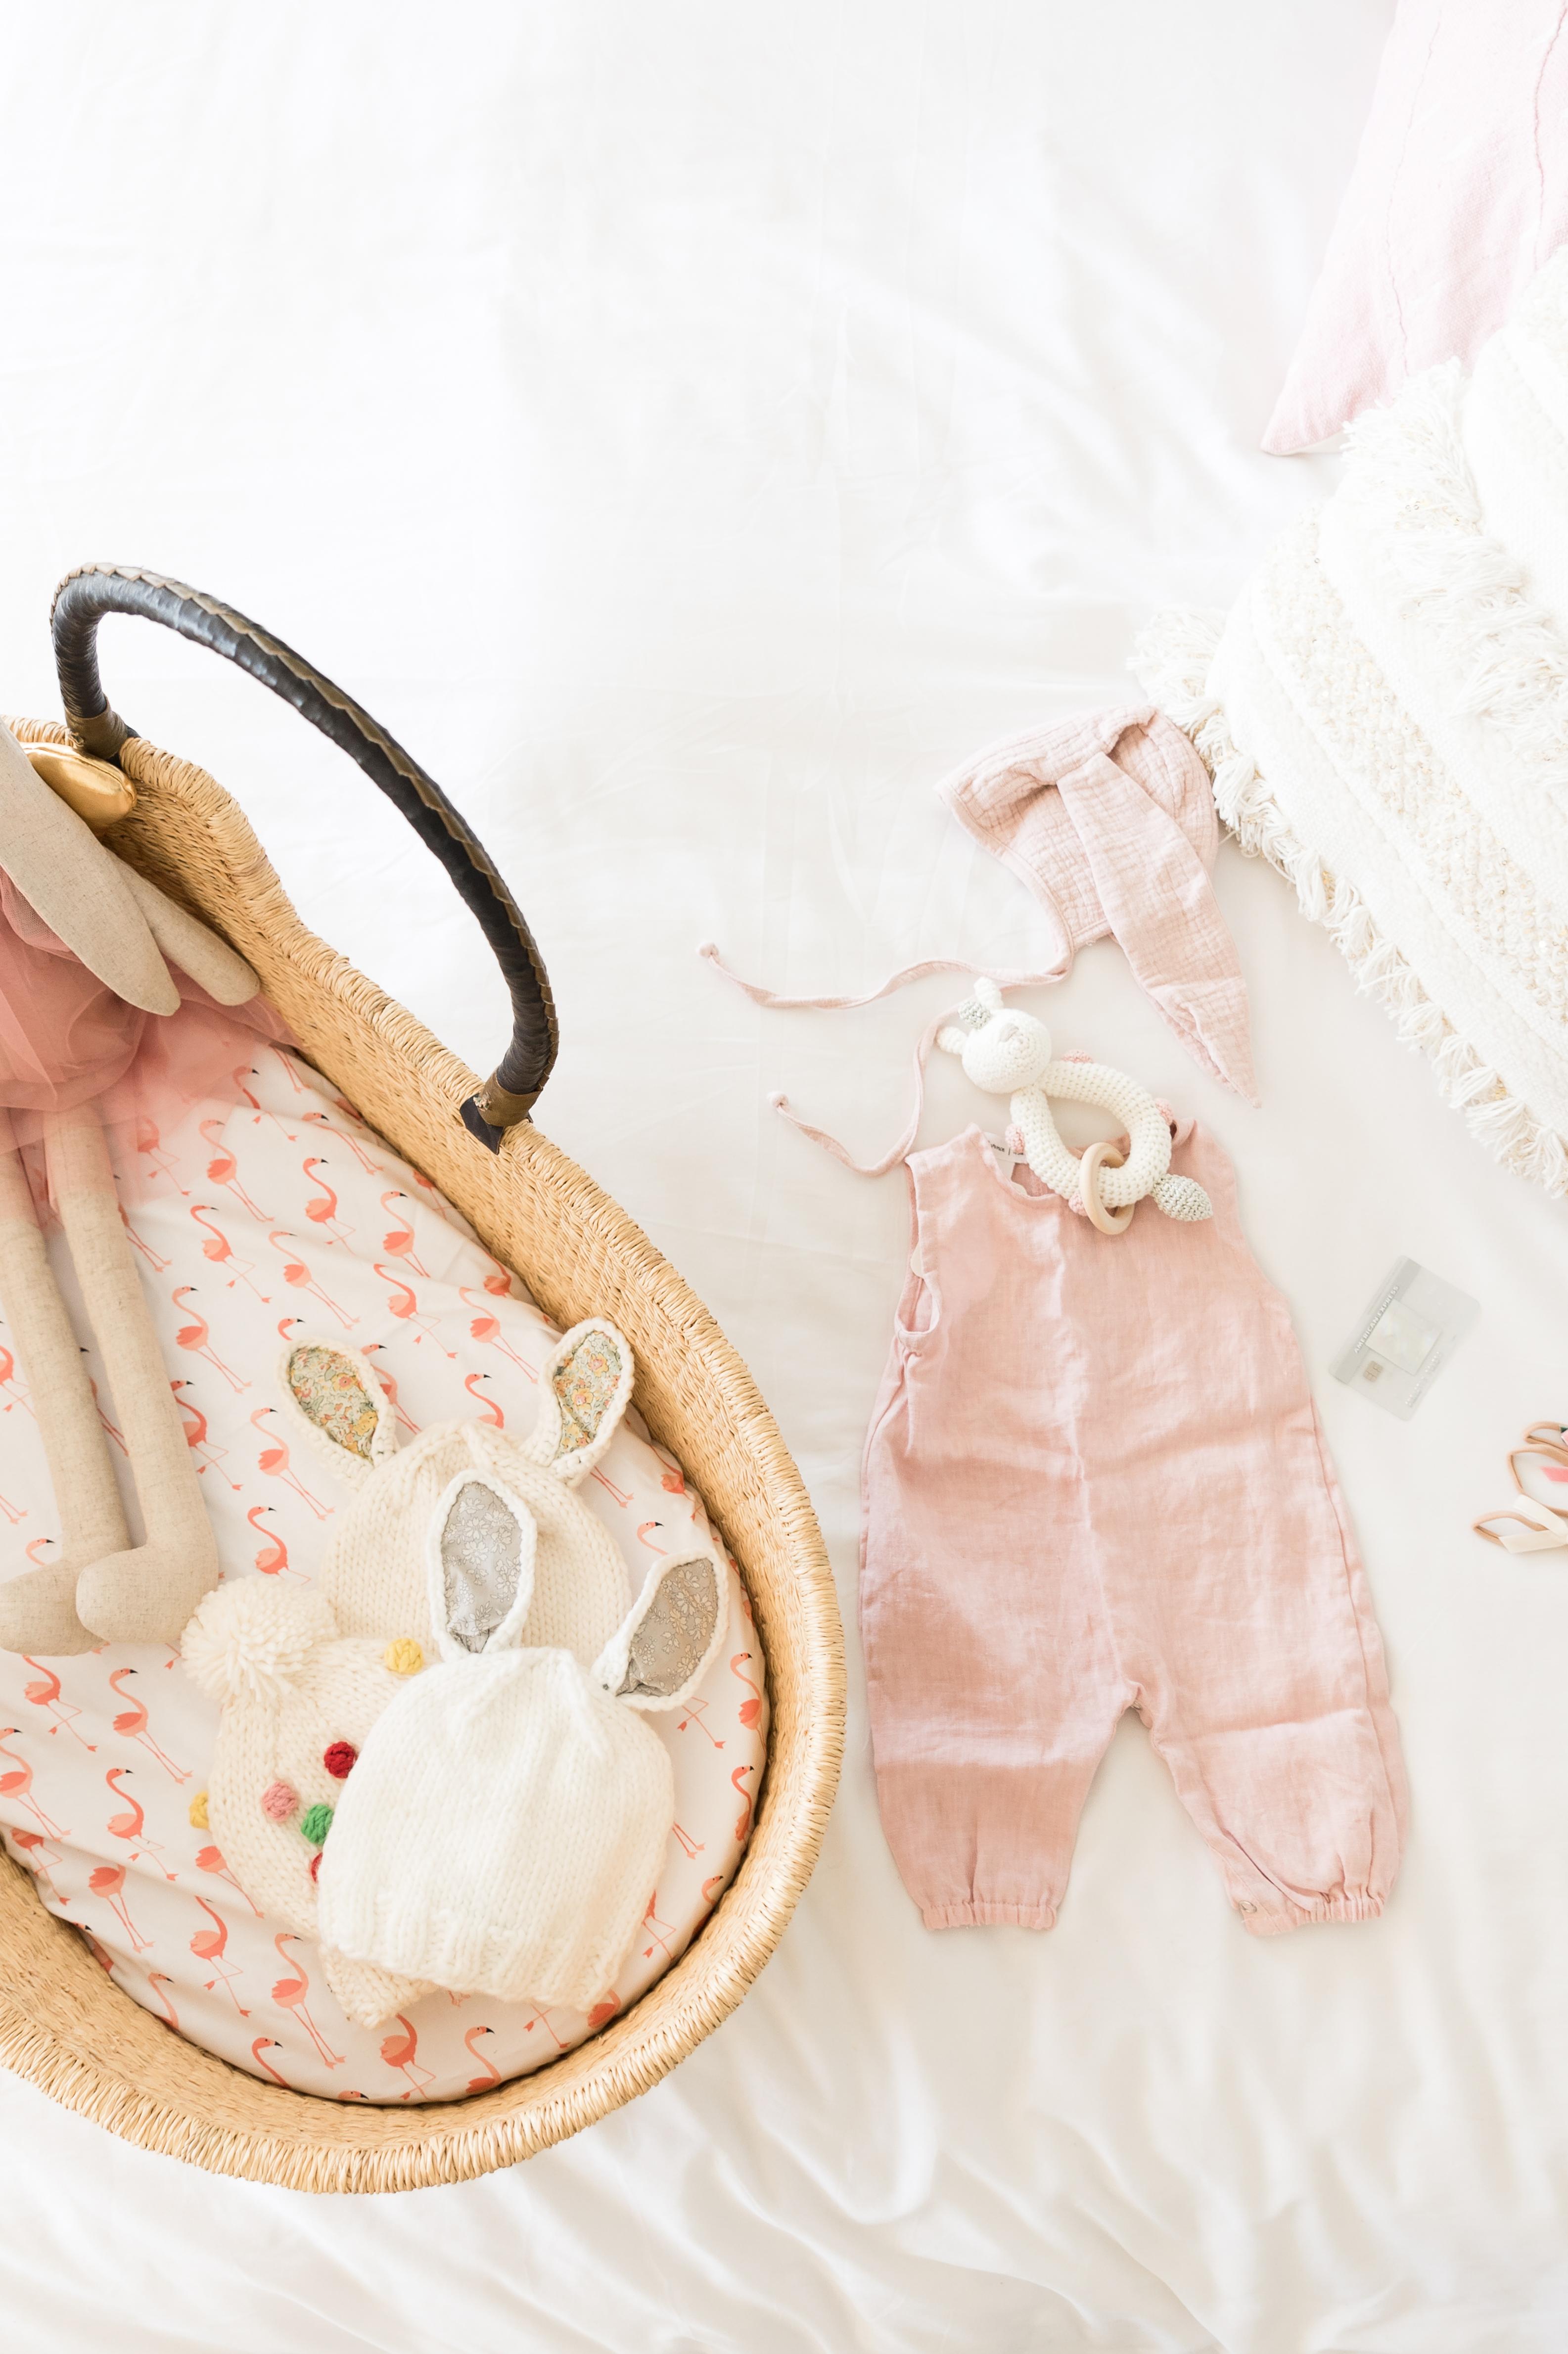 Summer Plans + Preparing For Baby